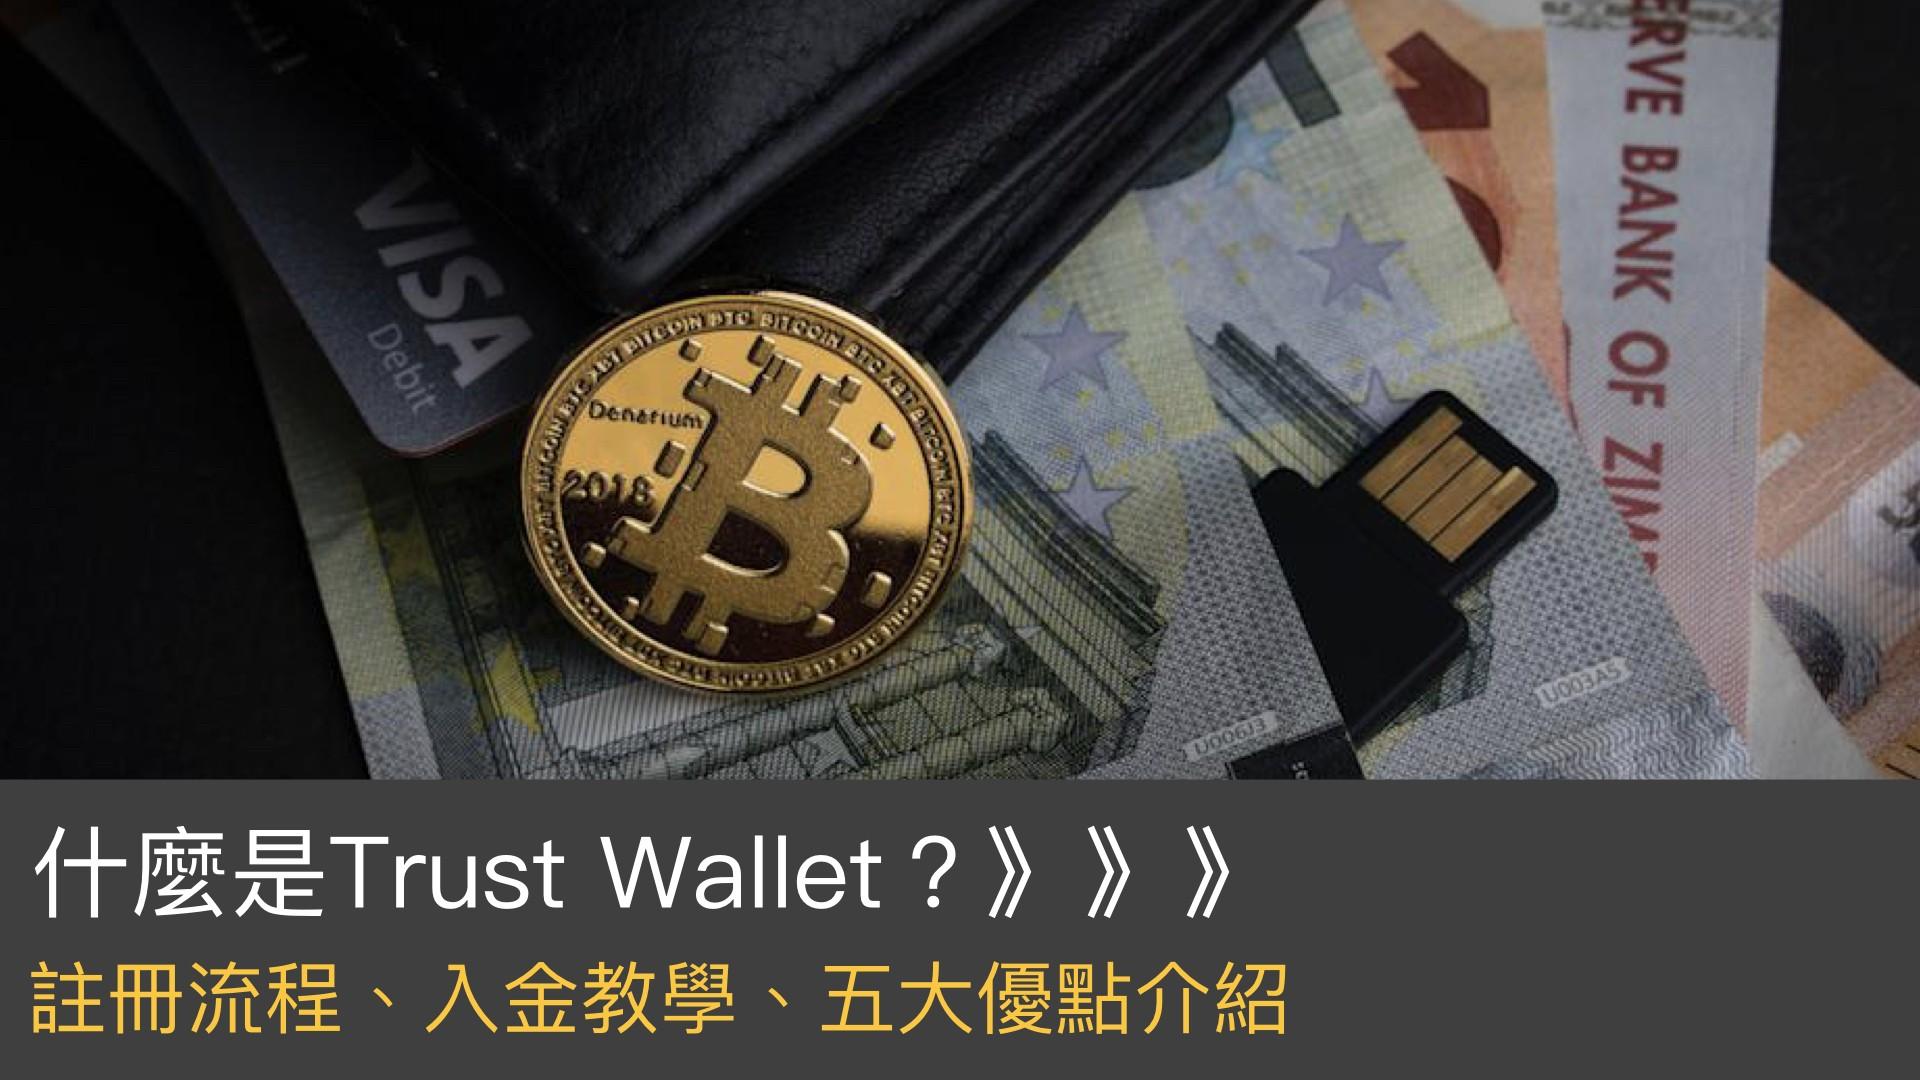 Trust Wallet 介紹:最實用的加密貨幣錢包、圖解操作流程、入金教學、服務內容